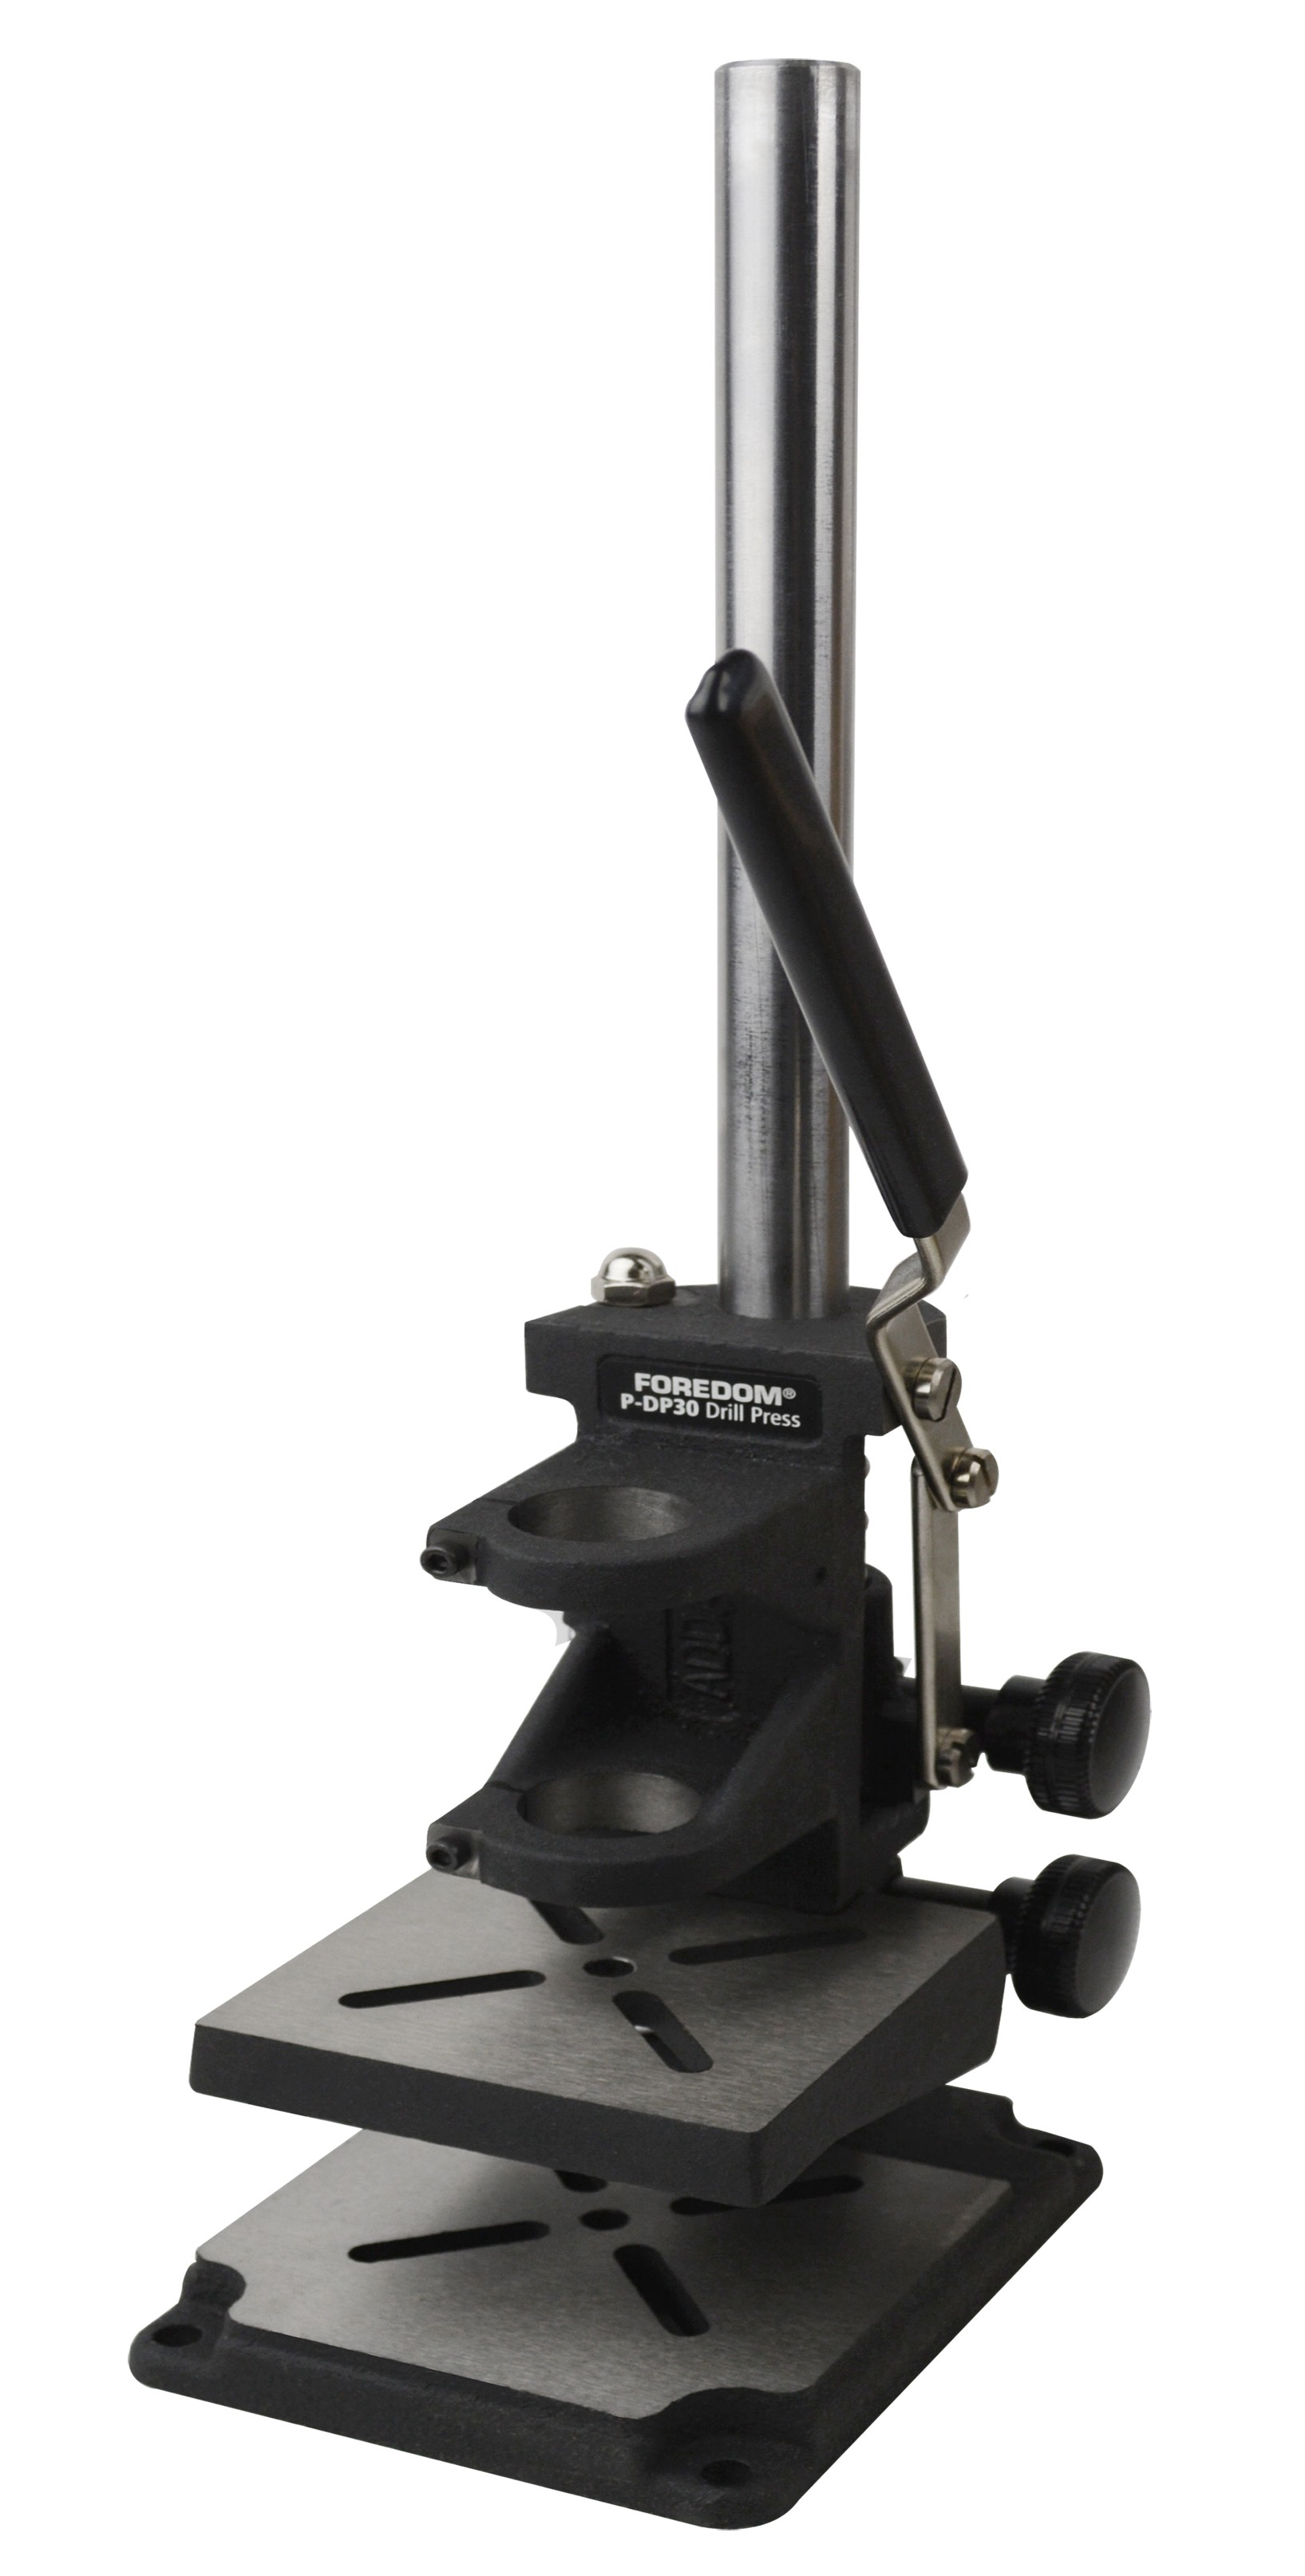 Foredom®' Drill Press - P-DP30